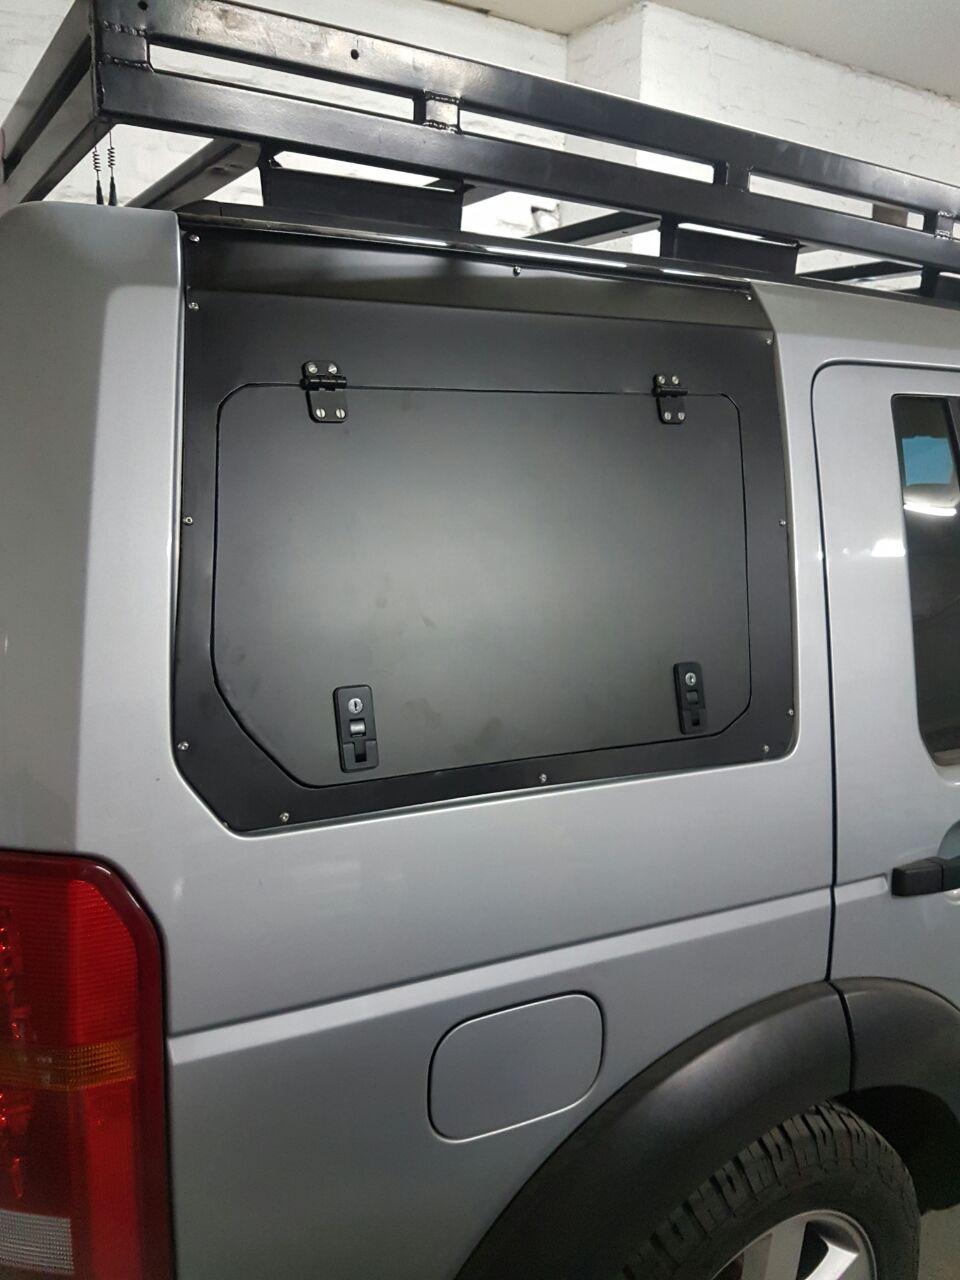 Land Rover Discovery Gullwing Doors Razorback Aluminium